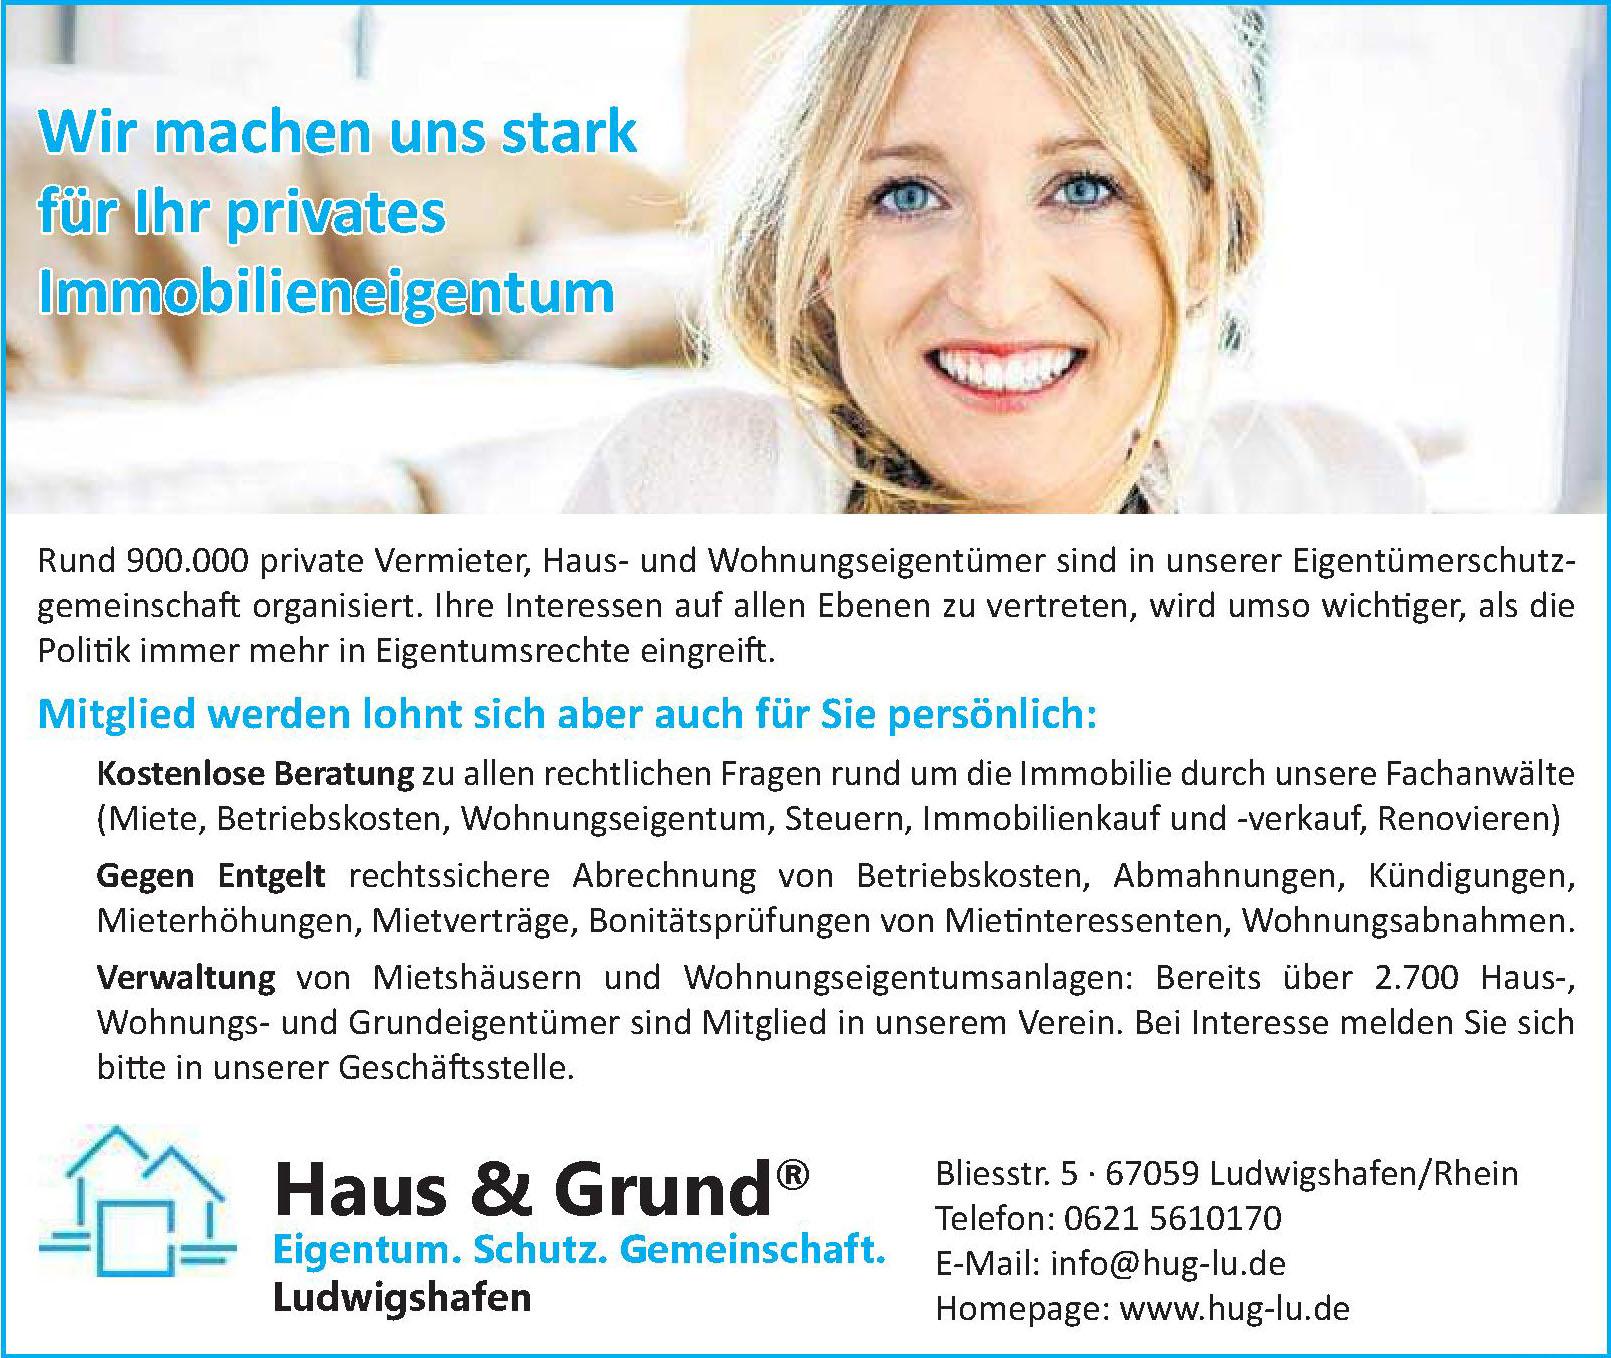 Haus & Grund Ludwigshafen/Rh. e.V.